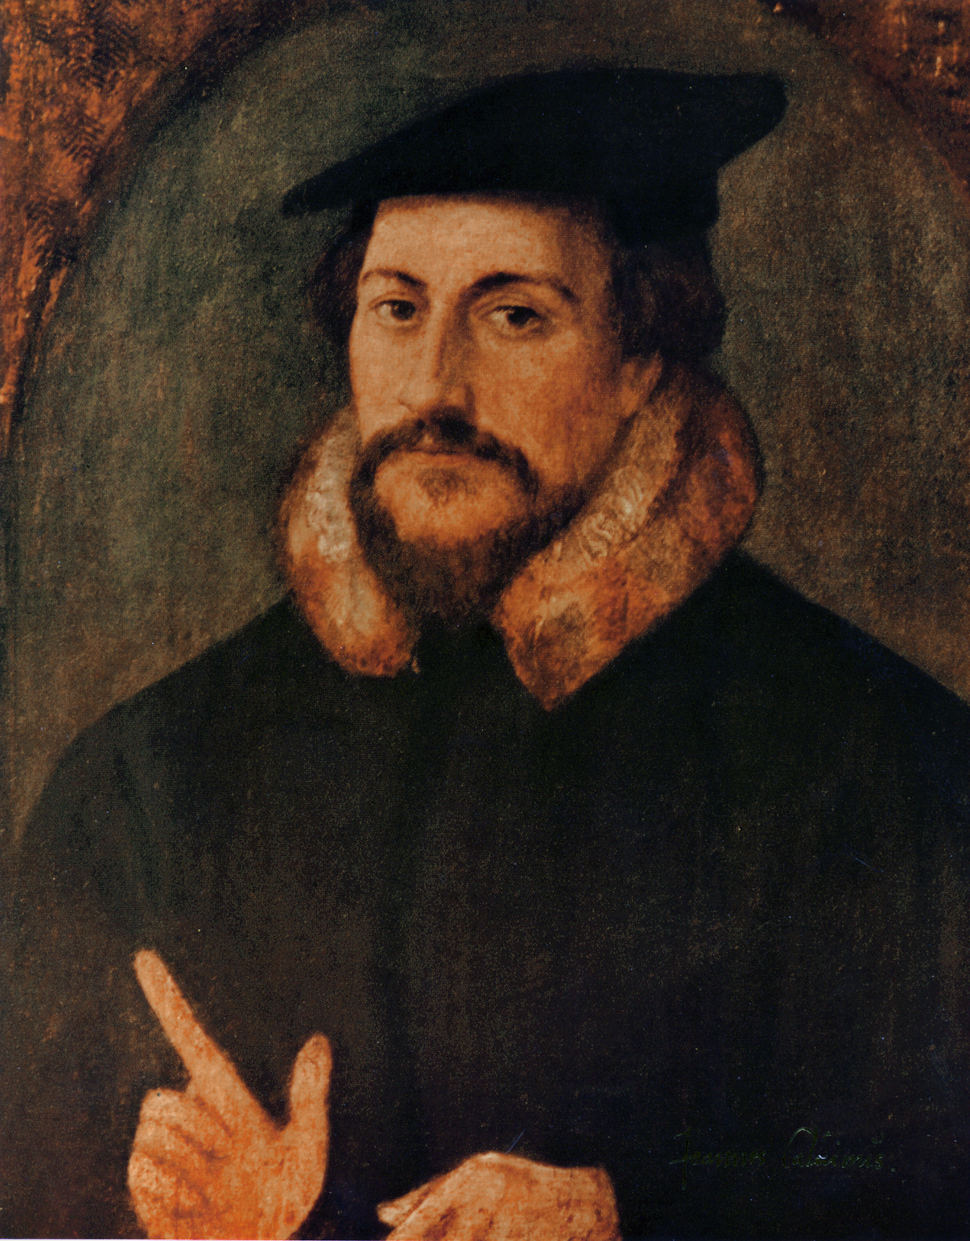 John Calvin by Holbein